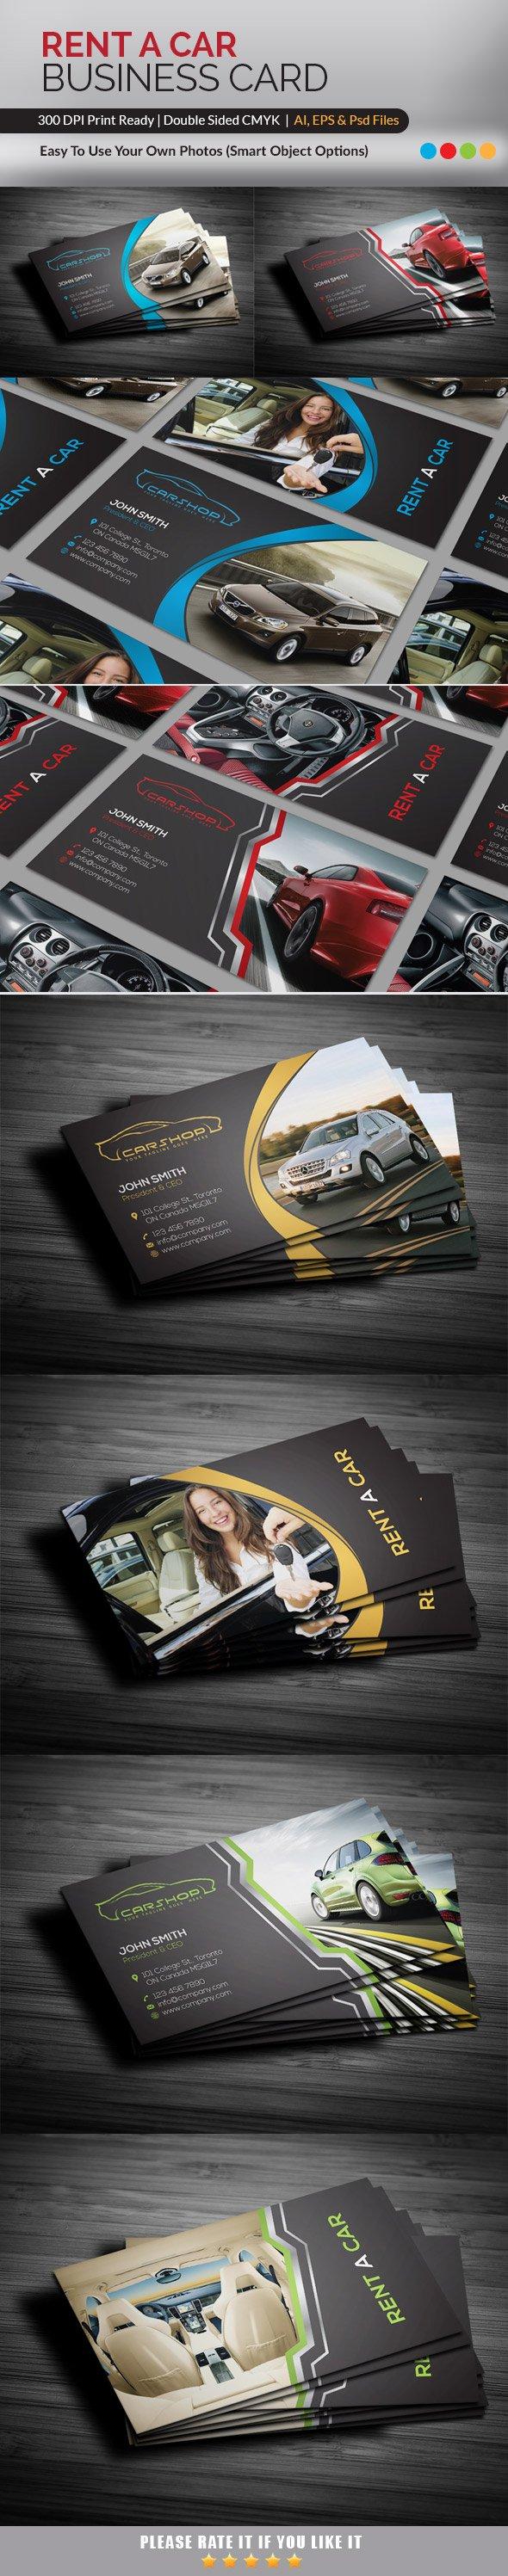 Rent a car business card business card templates creative market reheart Choice Image